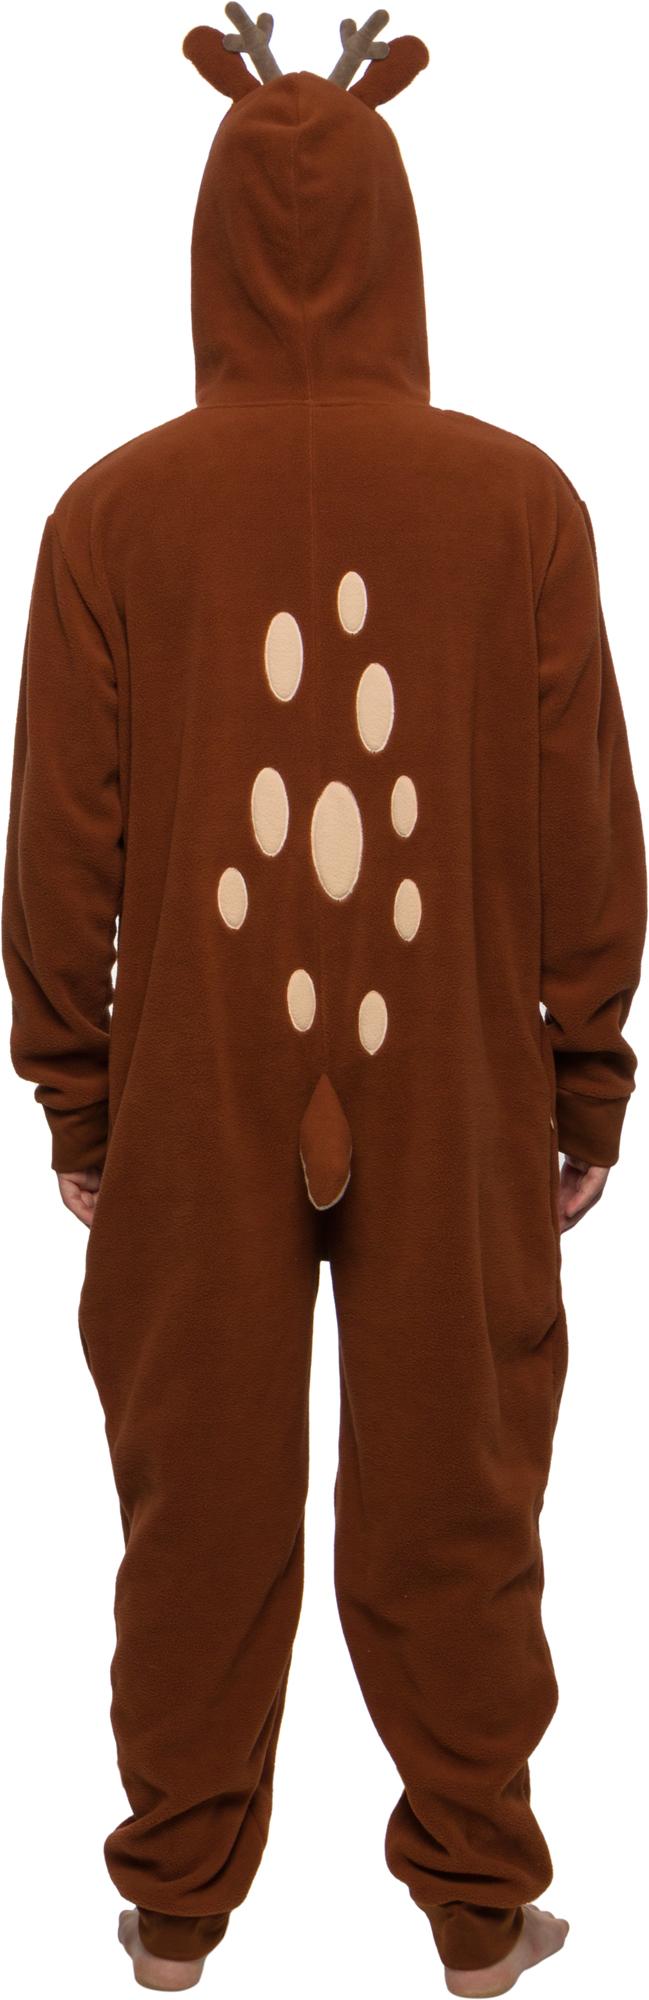 Reindeer Roses Pyjama/'s Nightwear Christmas Gift Sugar Skull Santa Mistletoe